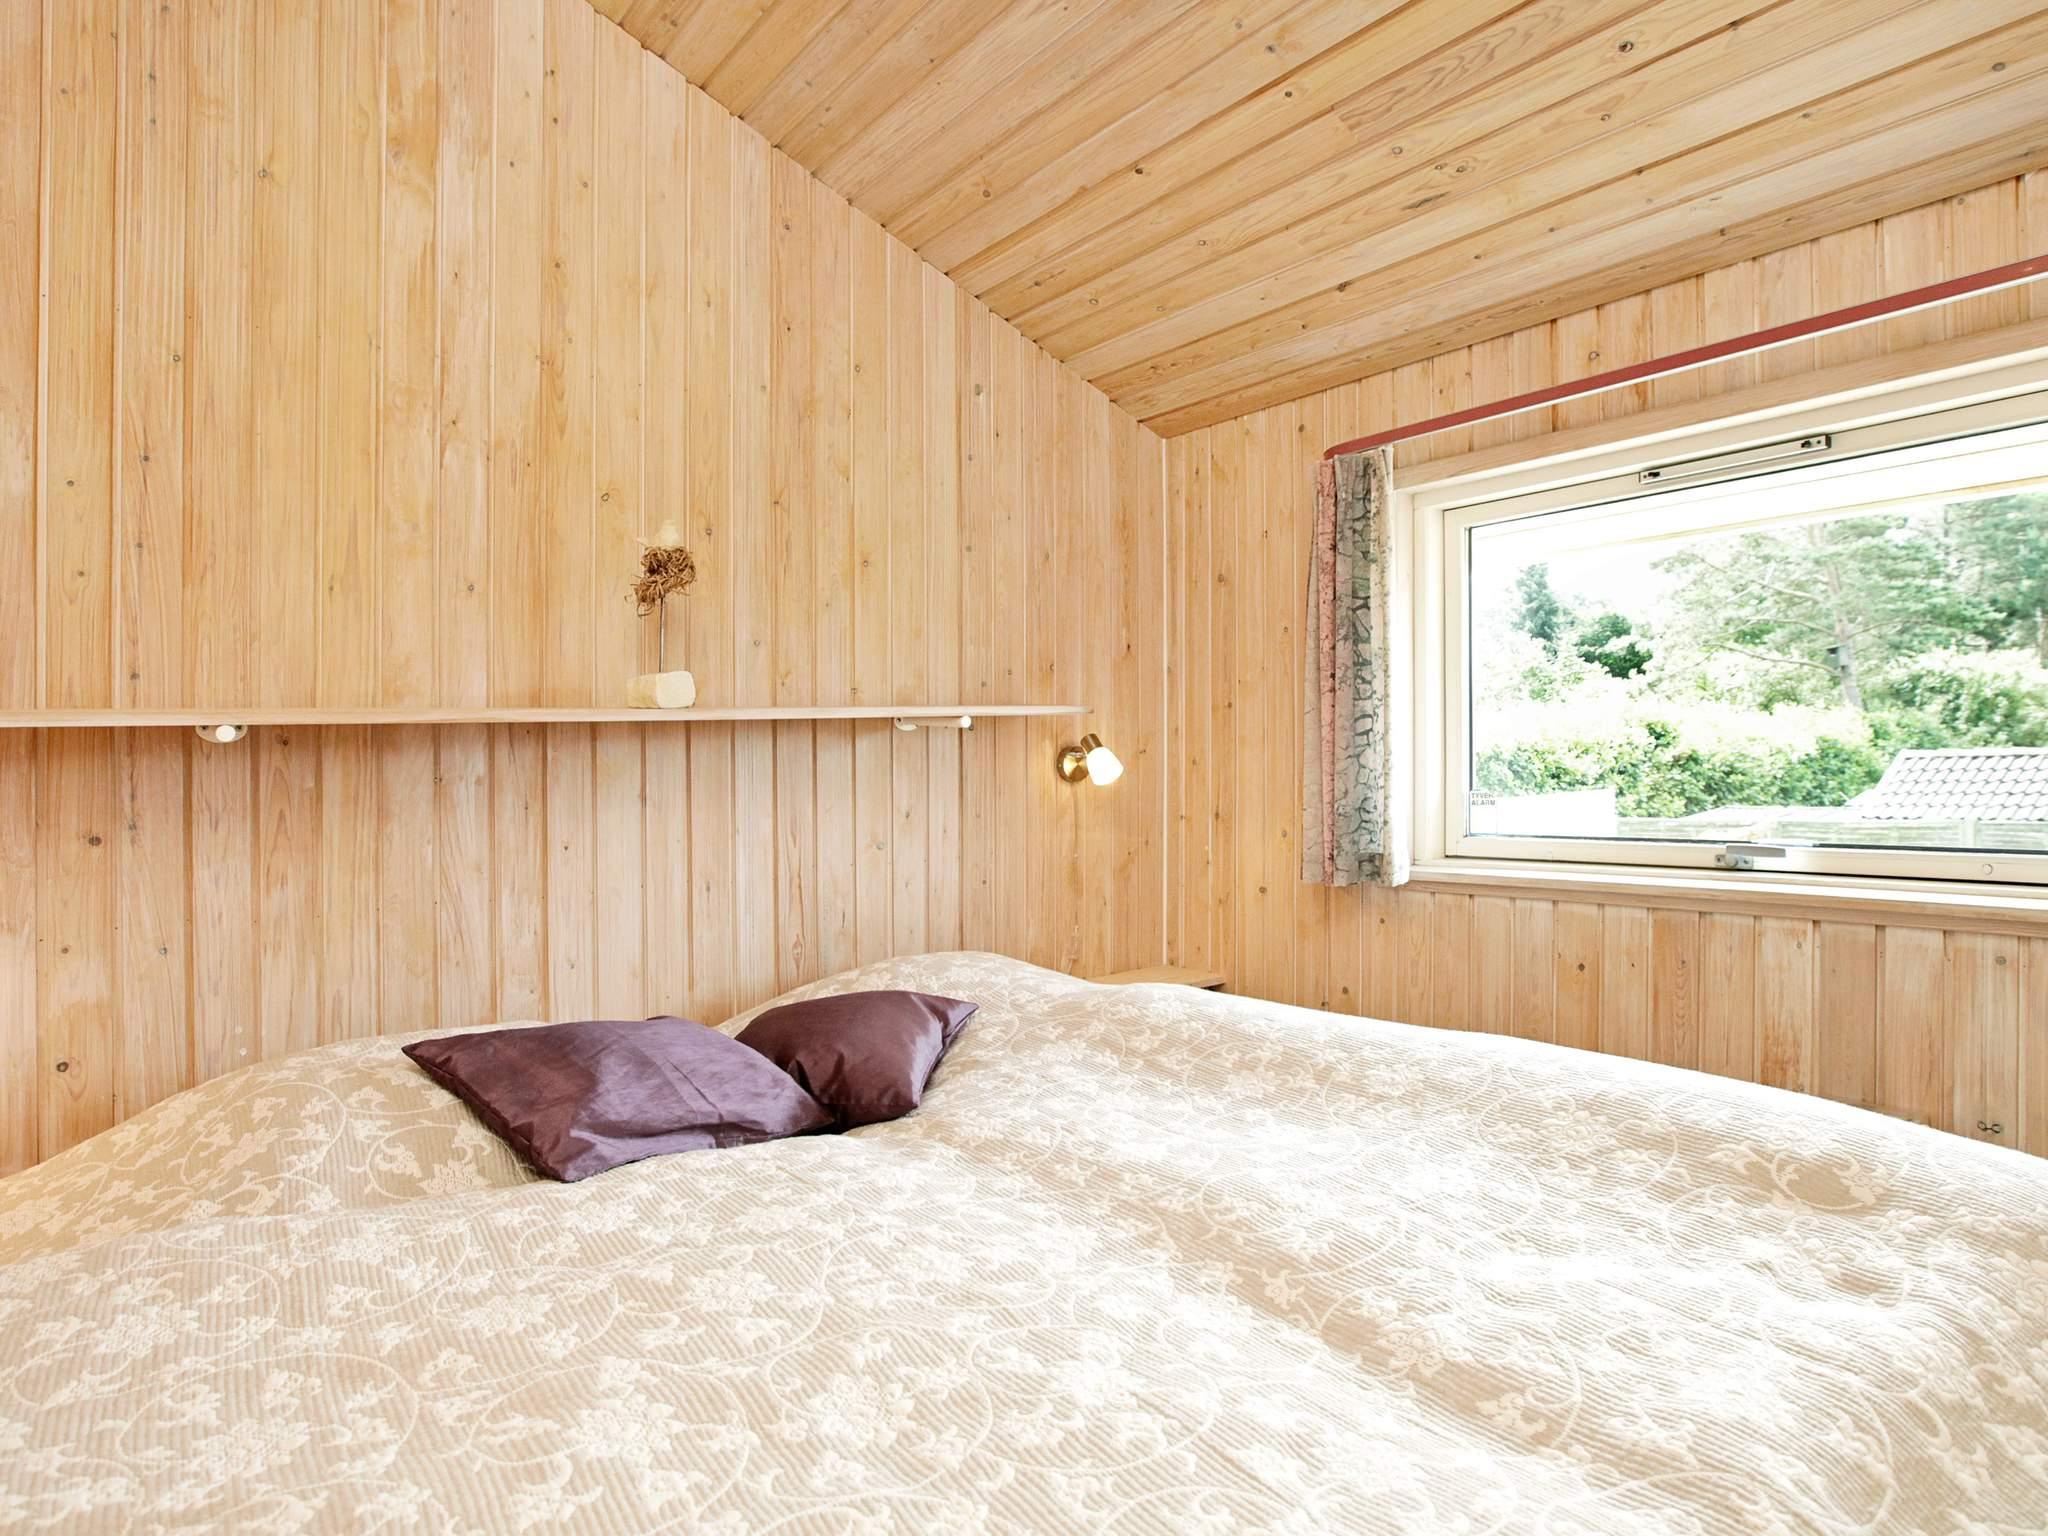 Maison de vacances Falsled (87545), Faldsled, , Fionie, Danemark, image 15